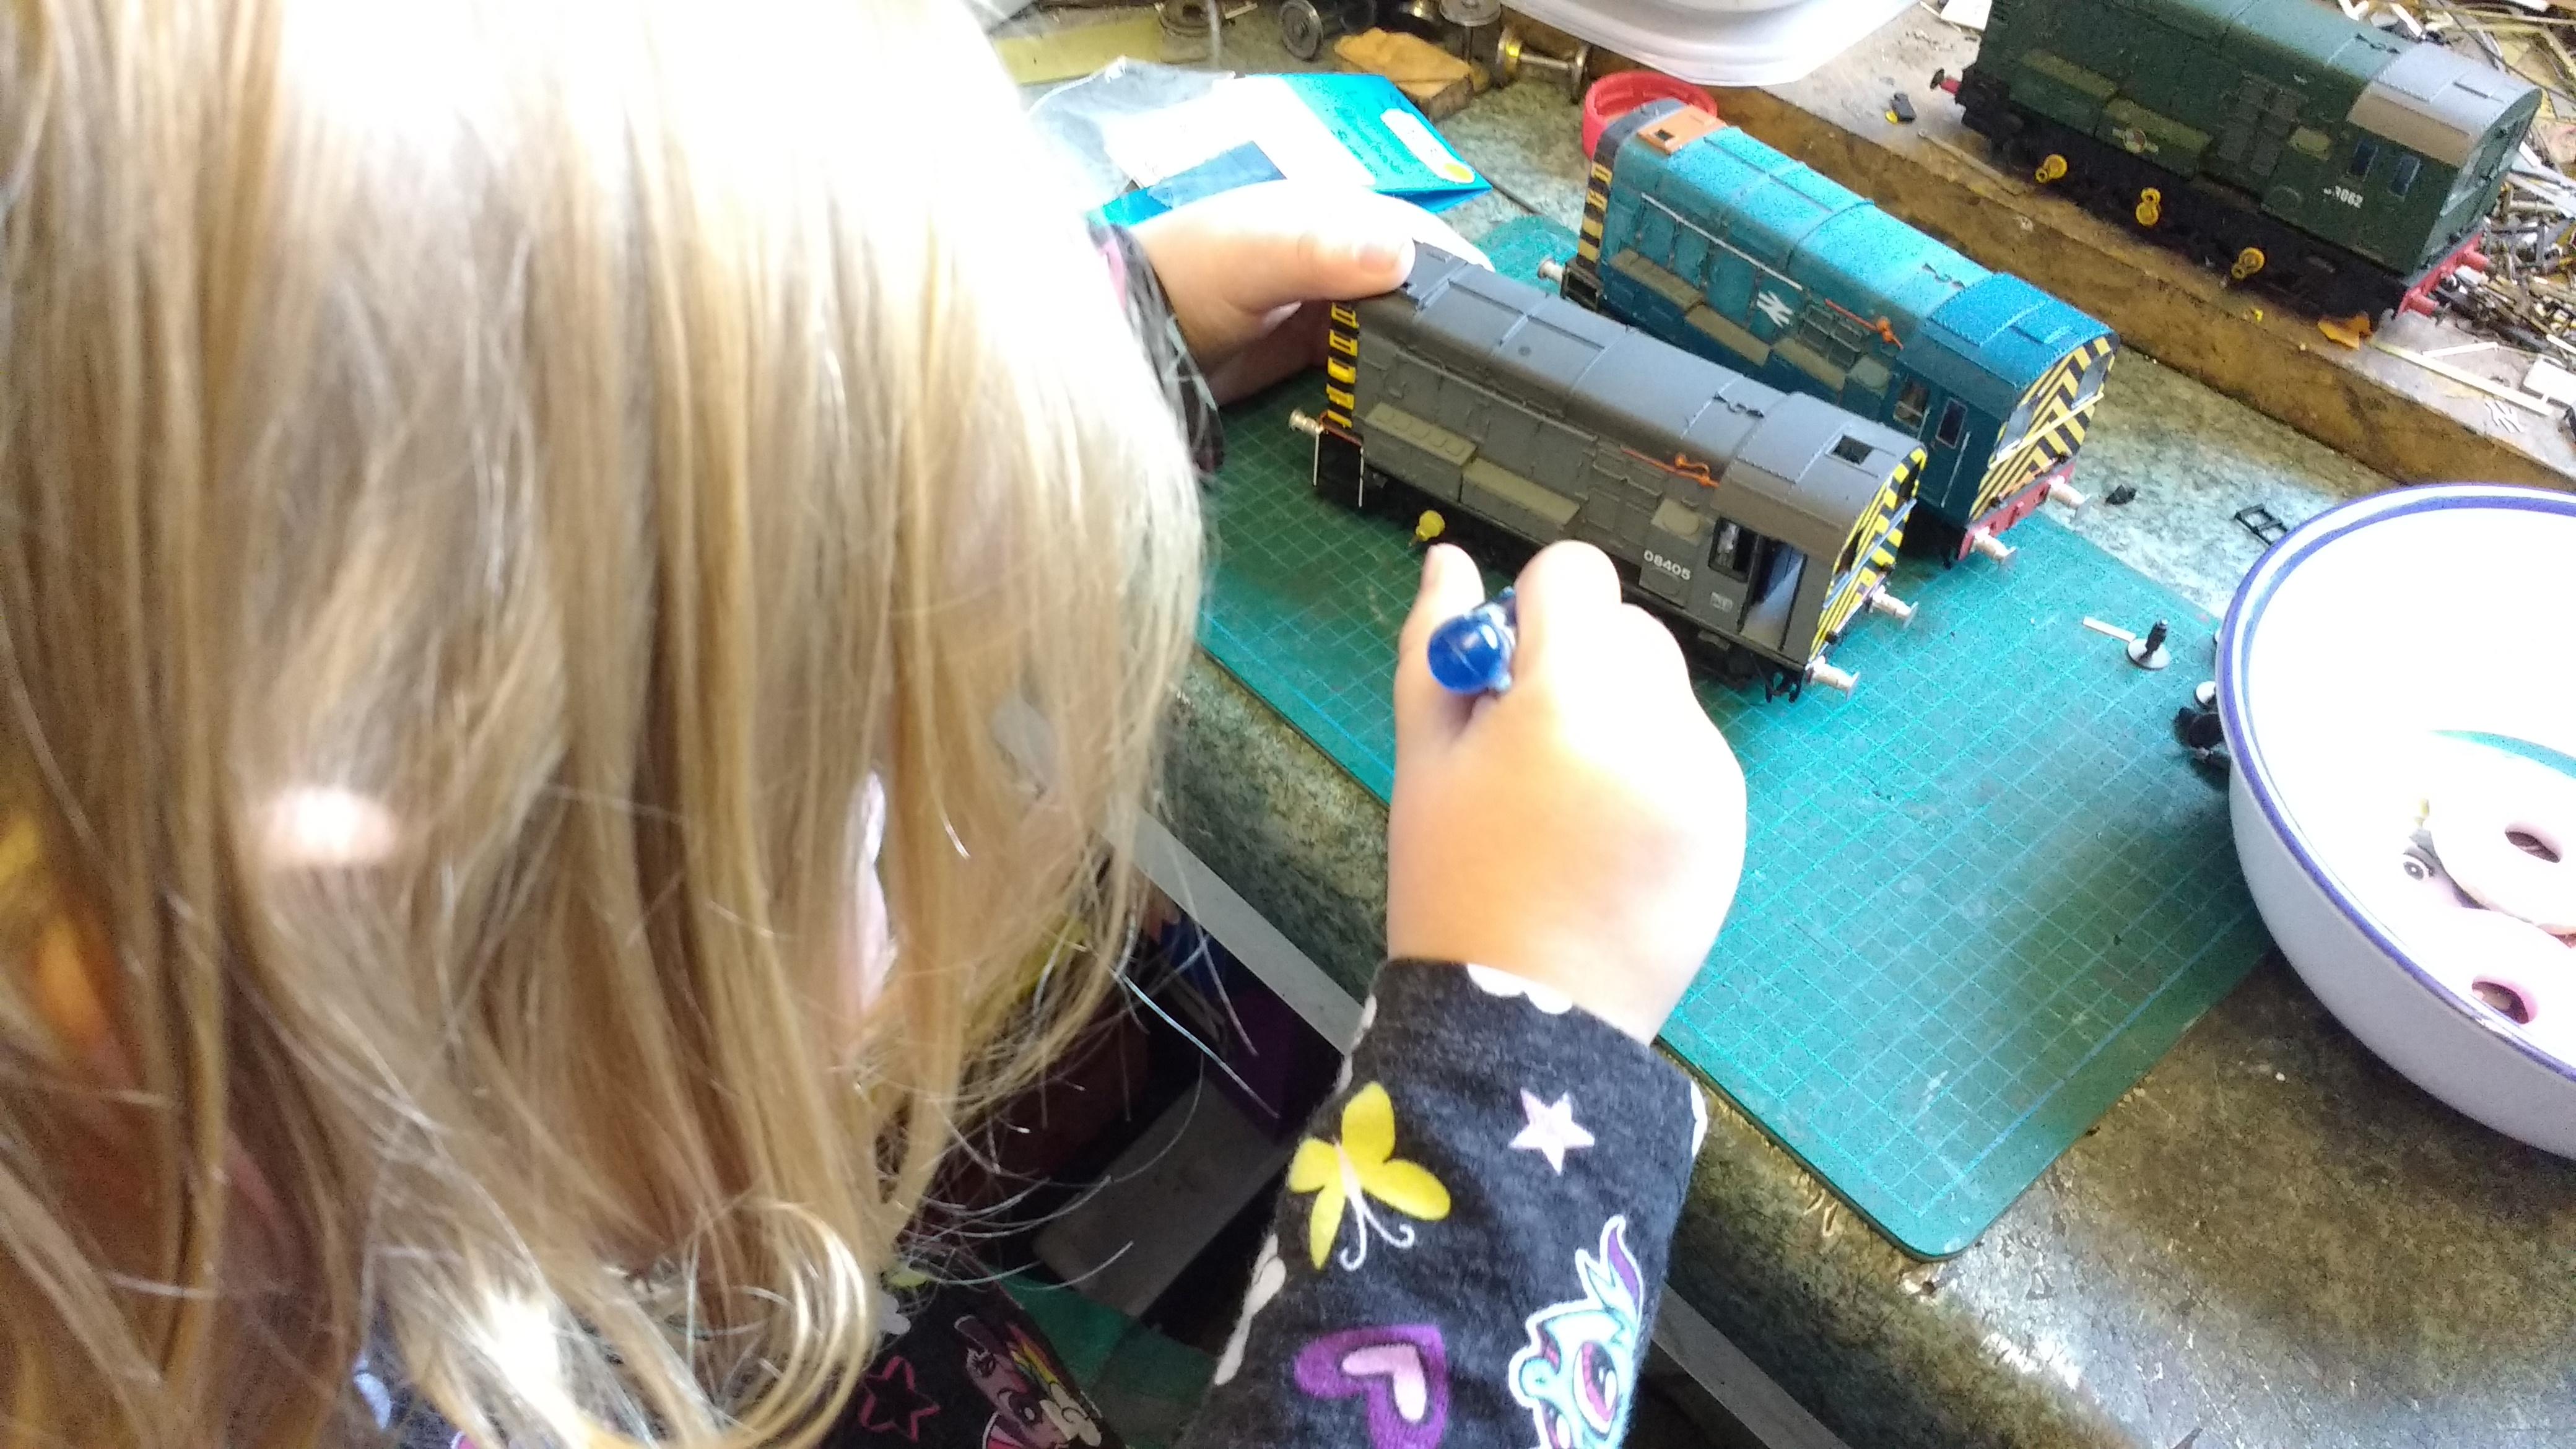 Wordless Wednesday – My Little Helper